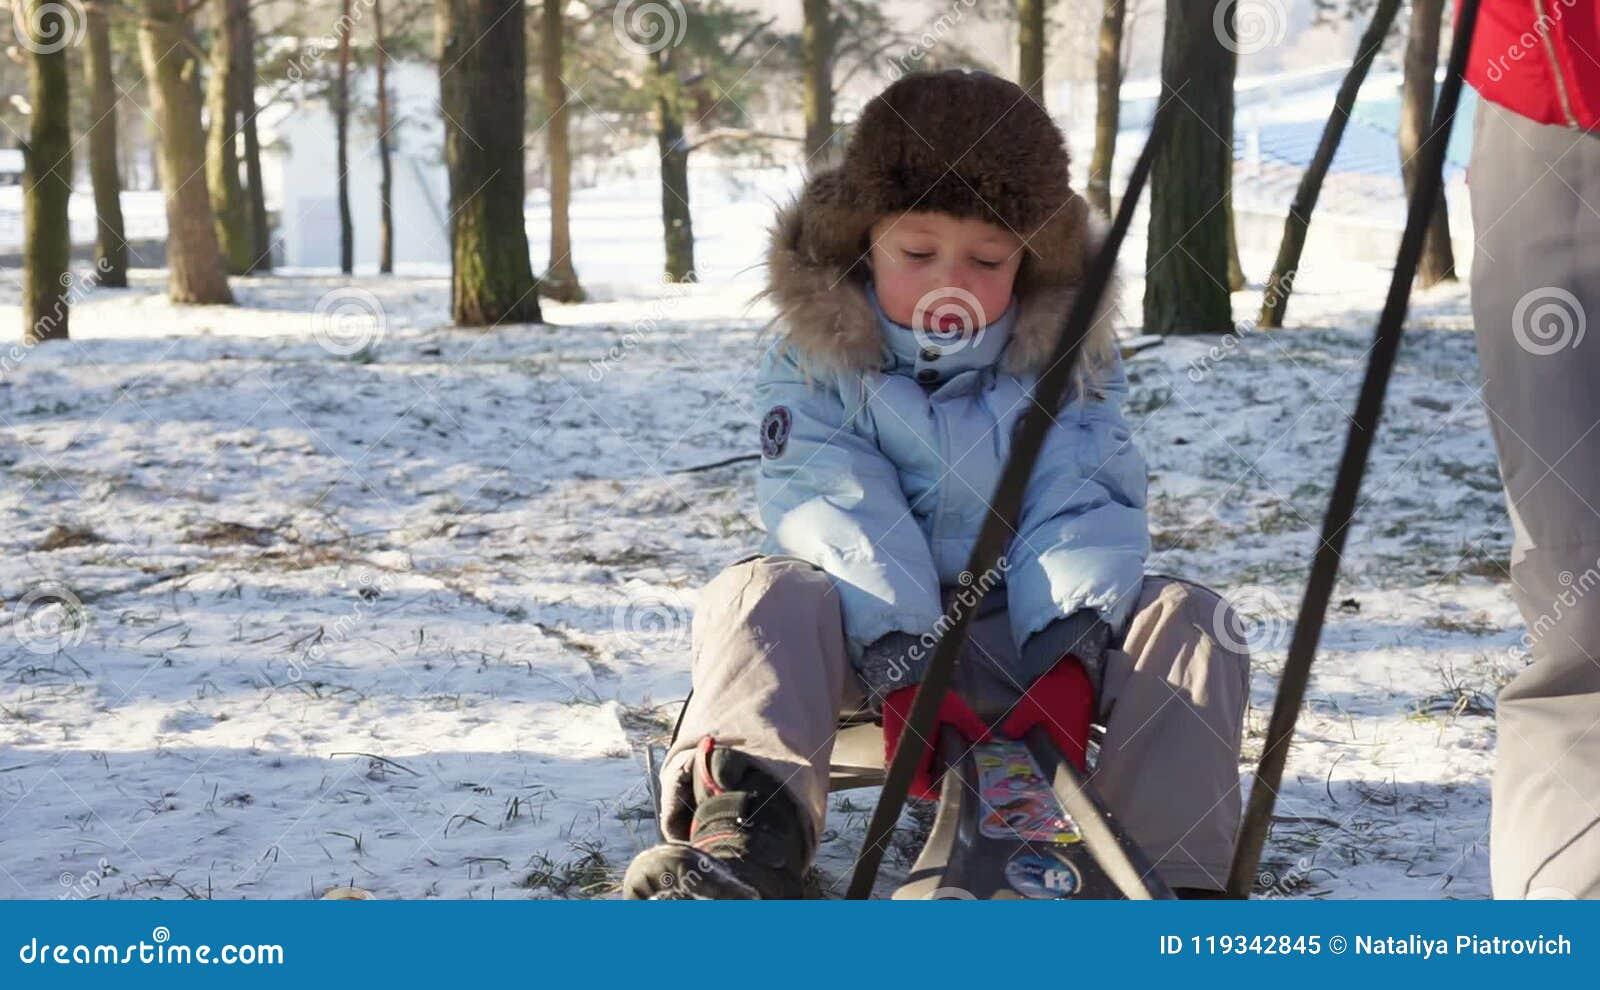 Christmas Vacation Sled.Boy Sledding On Snow Active Fun For Family Christmas Vacation